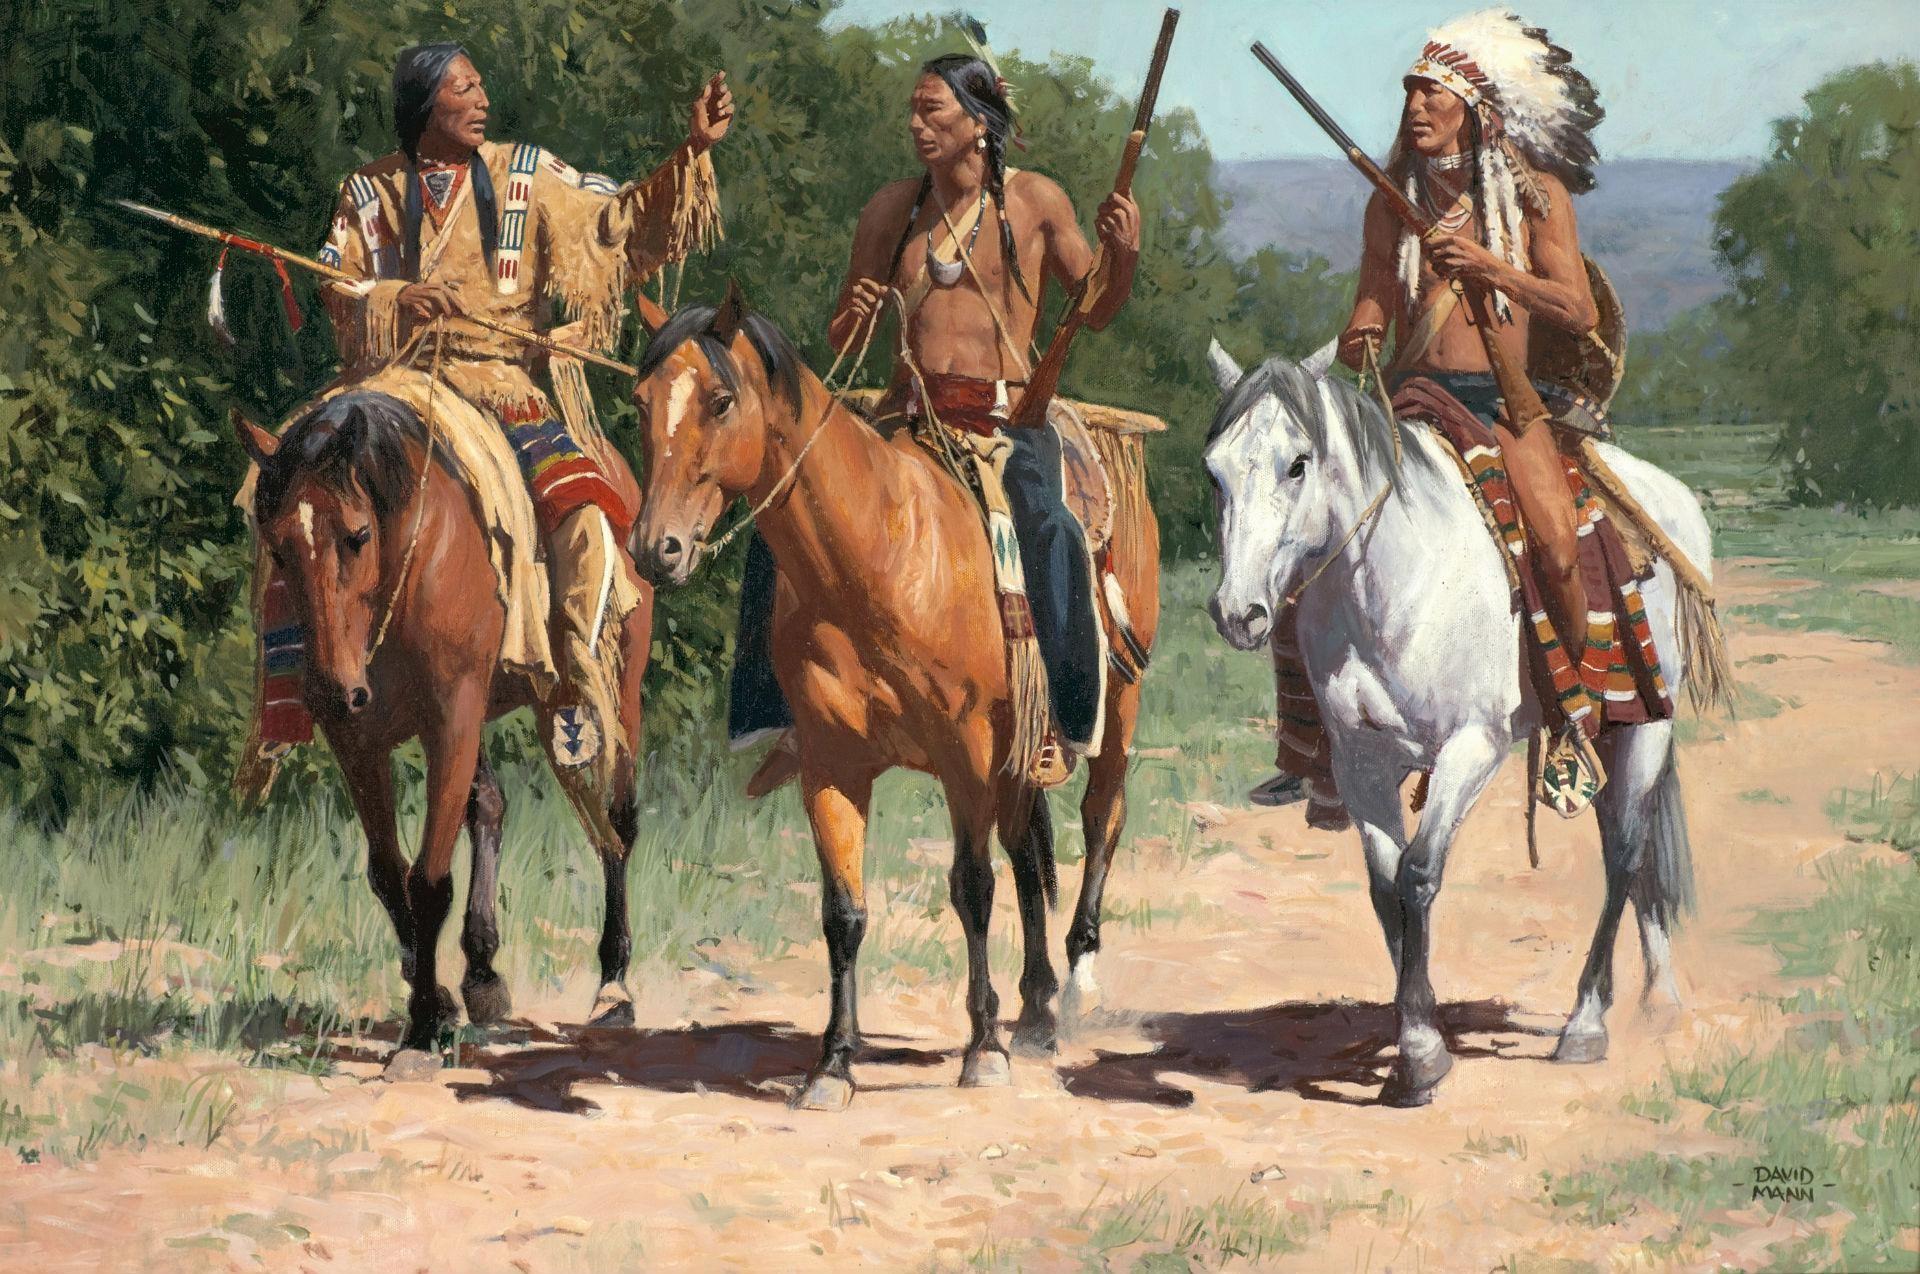 wallpaper.wiki-American-Indian-Horse-Paintings-Art-Western-